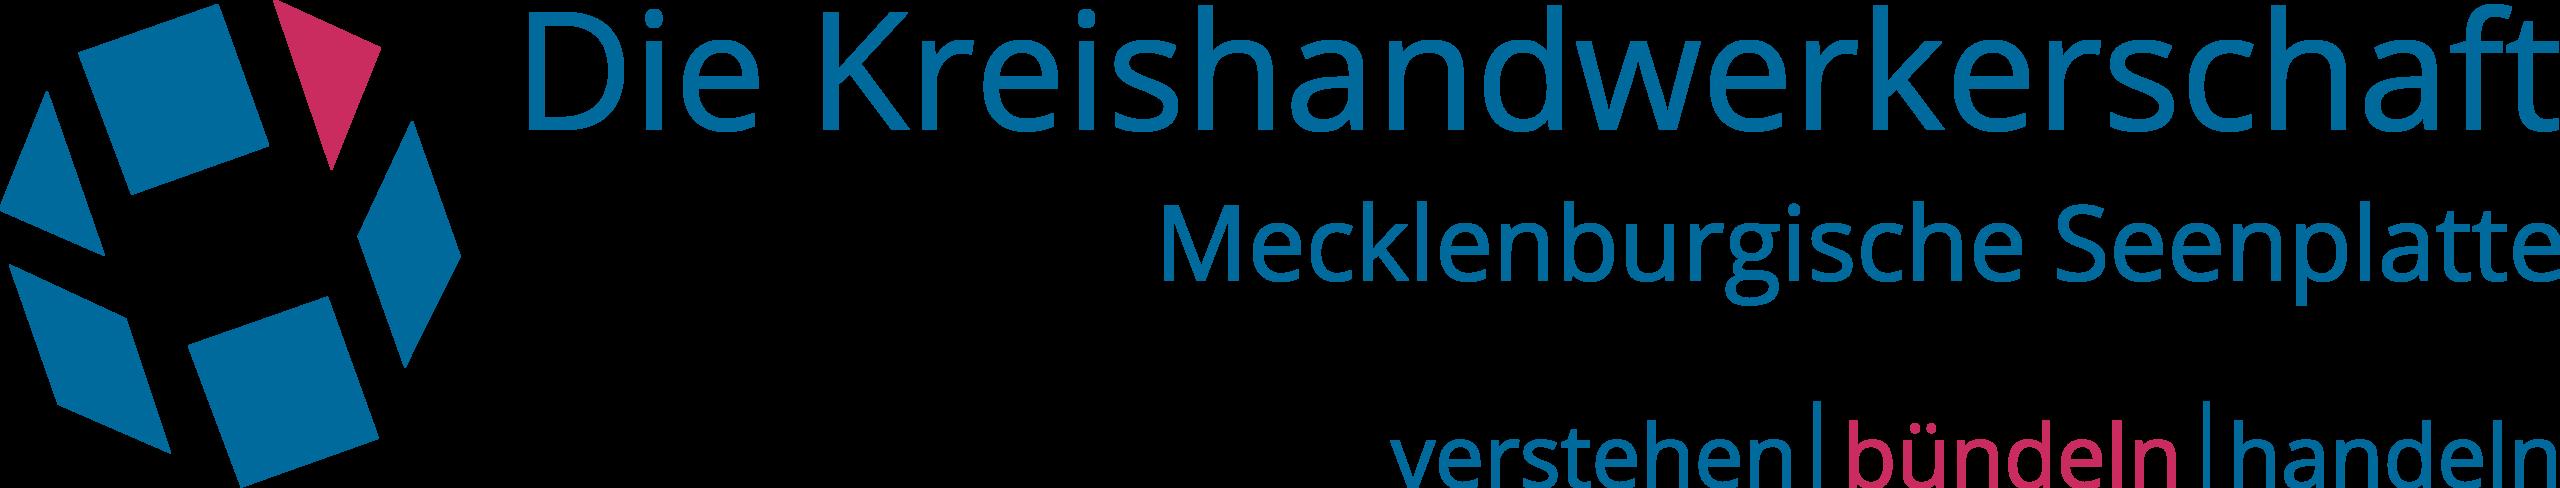 Kreishandwerkerschaft Mecklenburgische Seenplatte